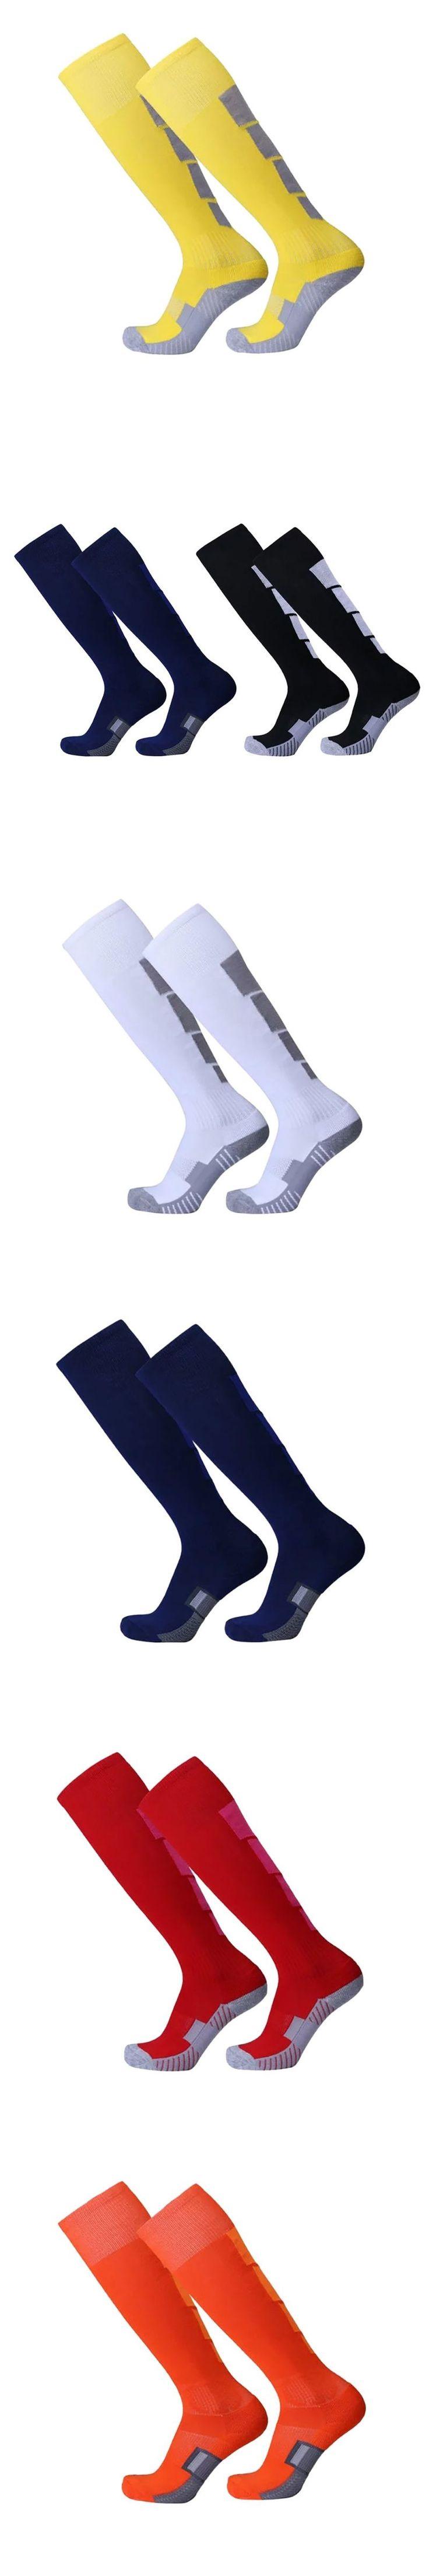 Men Boys Cotton Comfortable Leg Compression Long Socks Stretch Relief Soft Socks Plain Over Knee High Sock